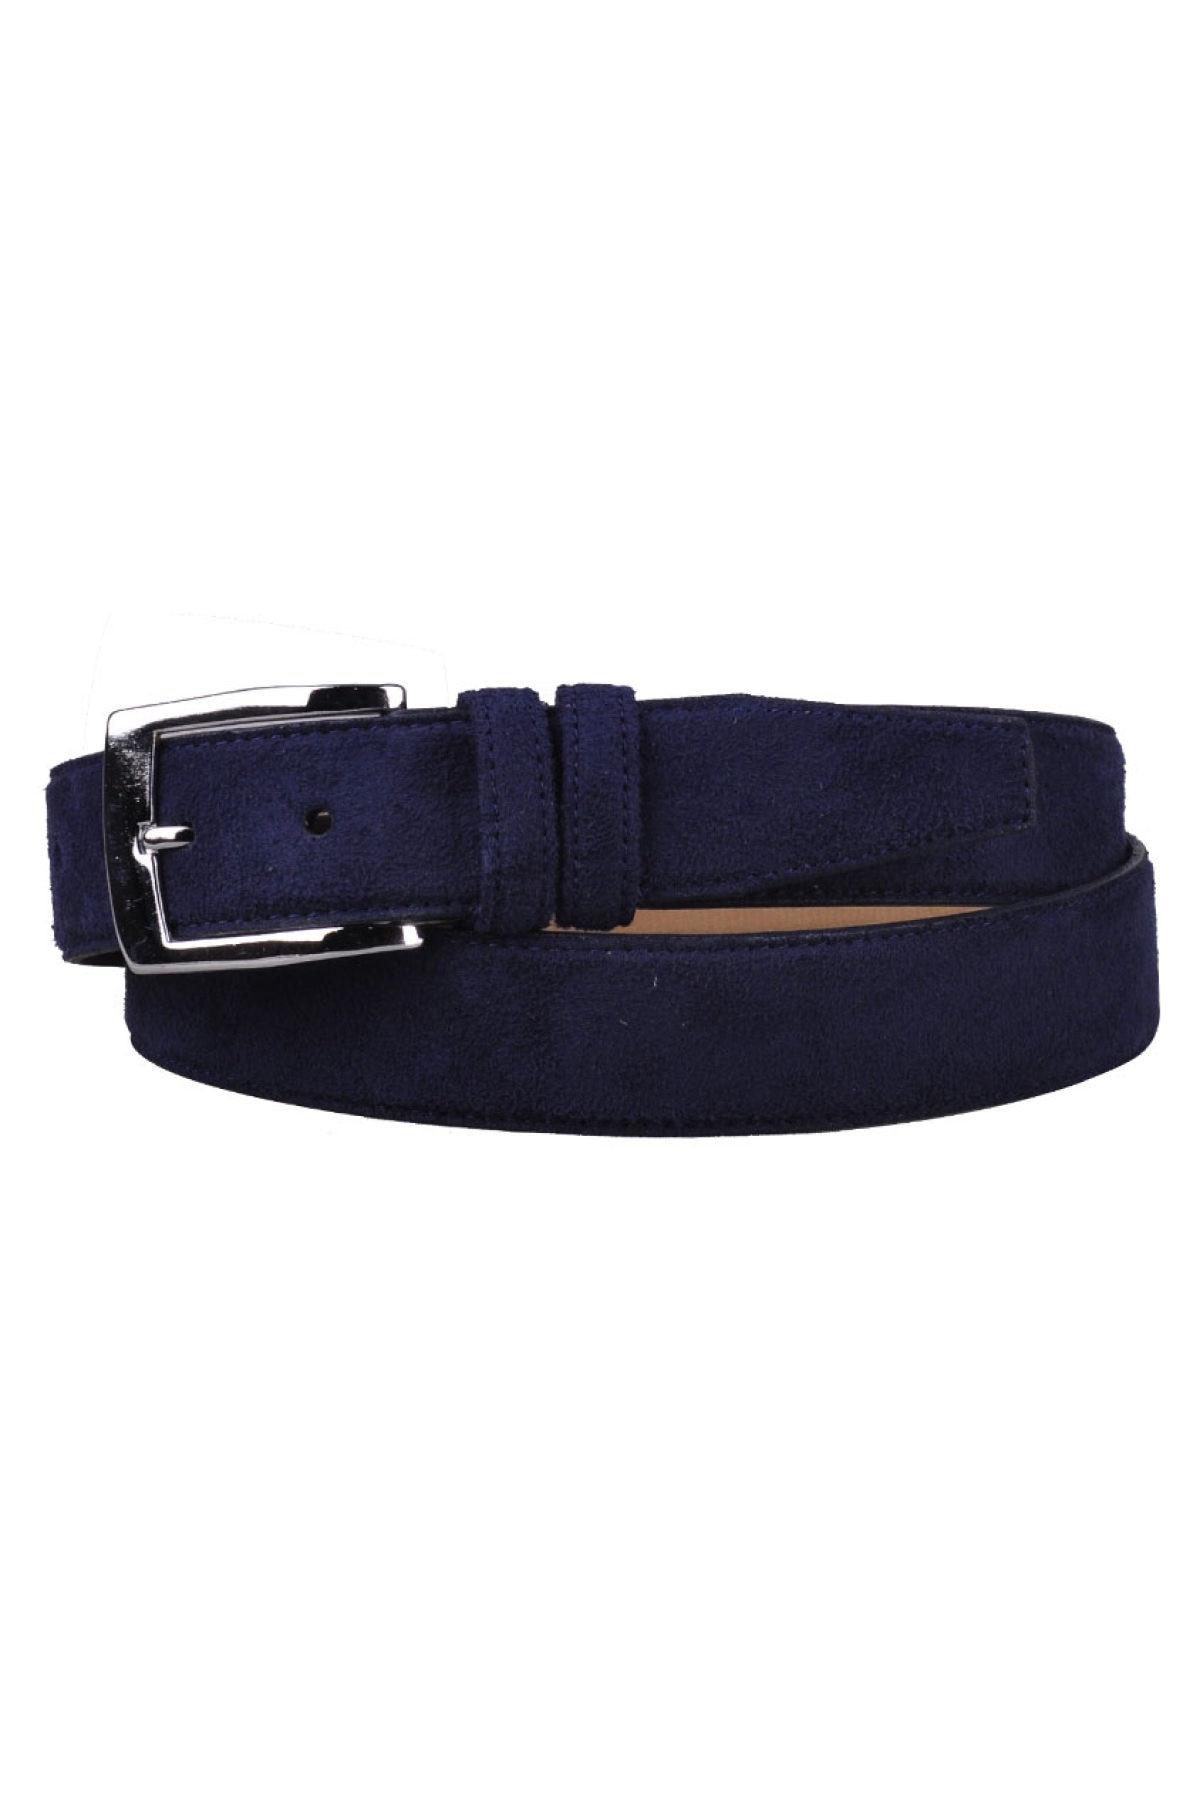 Trg Polo جلد الغزال-حزام رجالي كلاسيكي ، أربعة خيارات ألوان مختلفة ، عرض 3,5 سنتيمتر ، طول 105-130 سنتيمتر ، تصميم شعار خاص